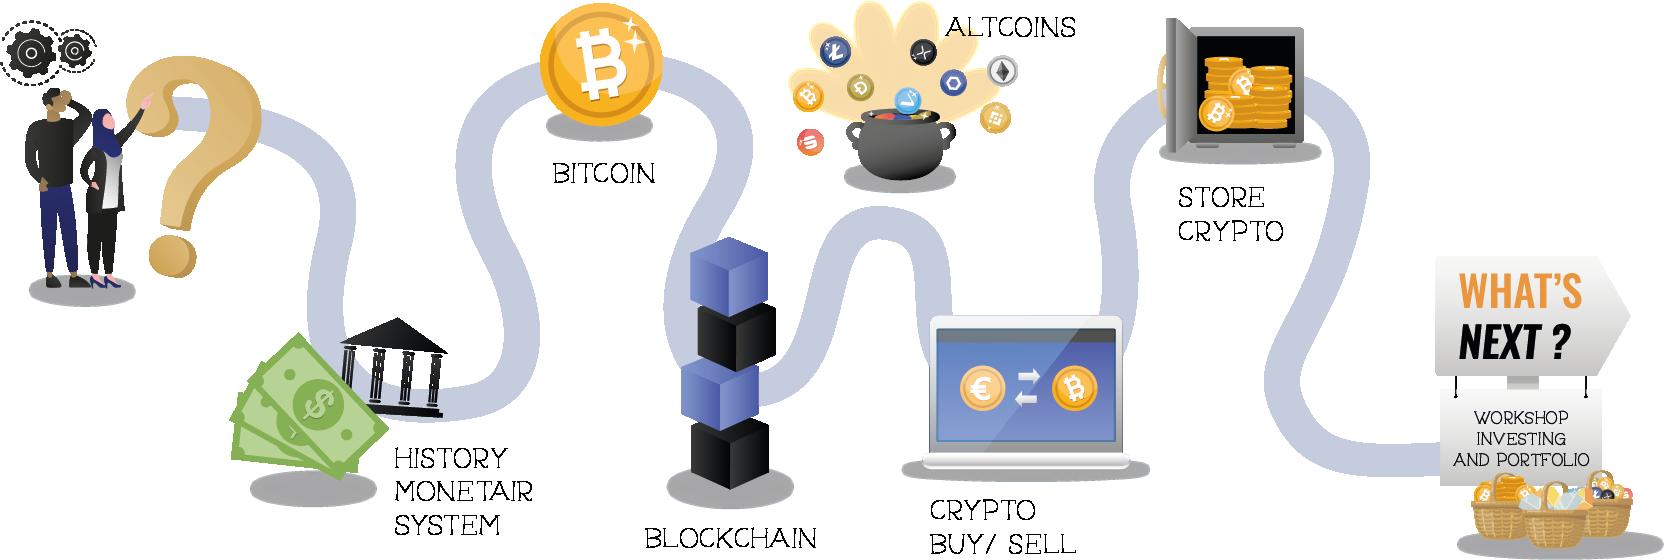 Crypto and Blockchain workshop